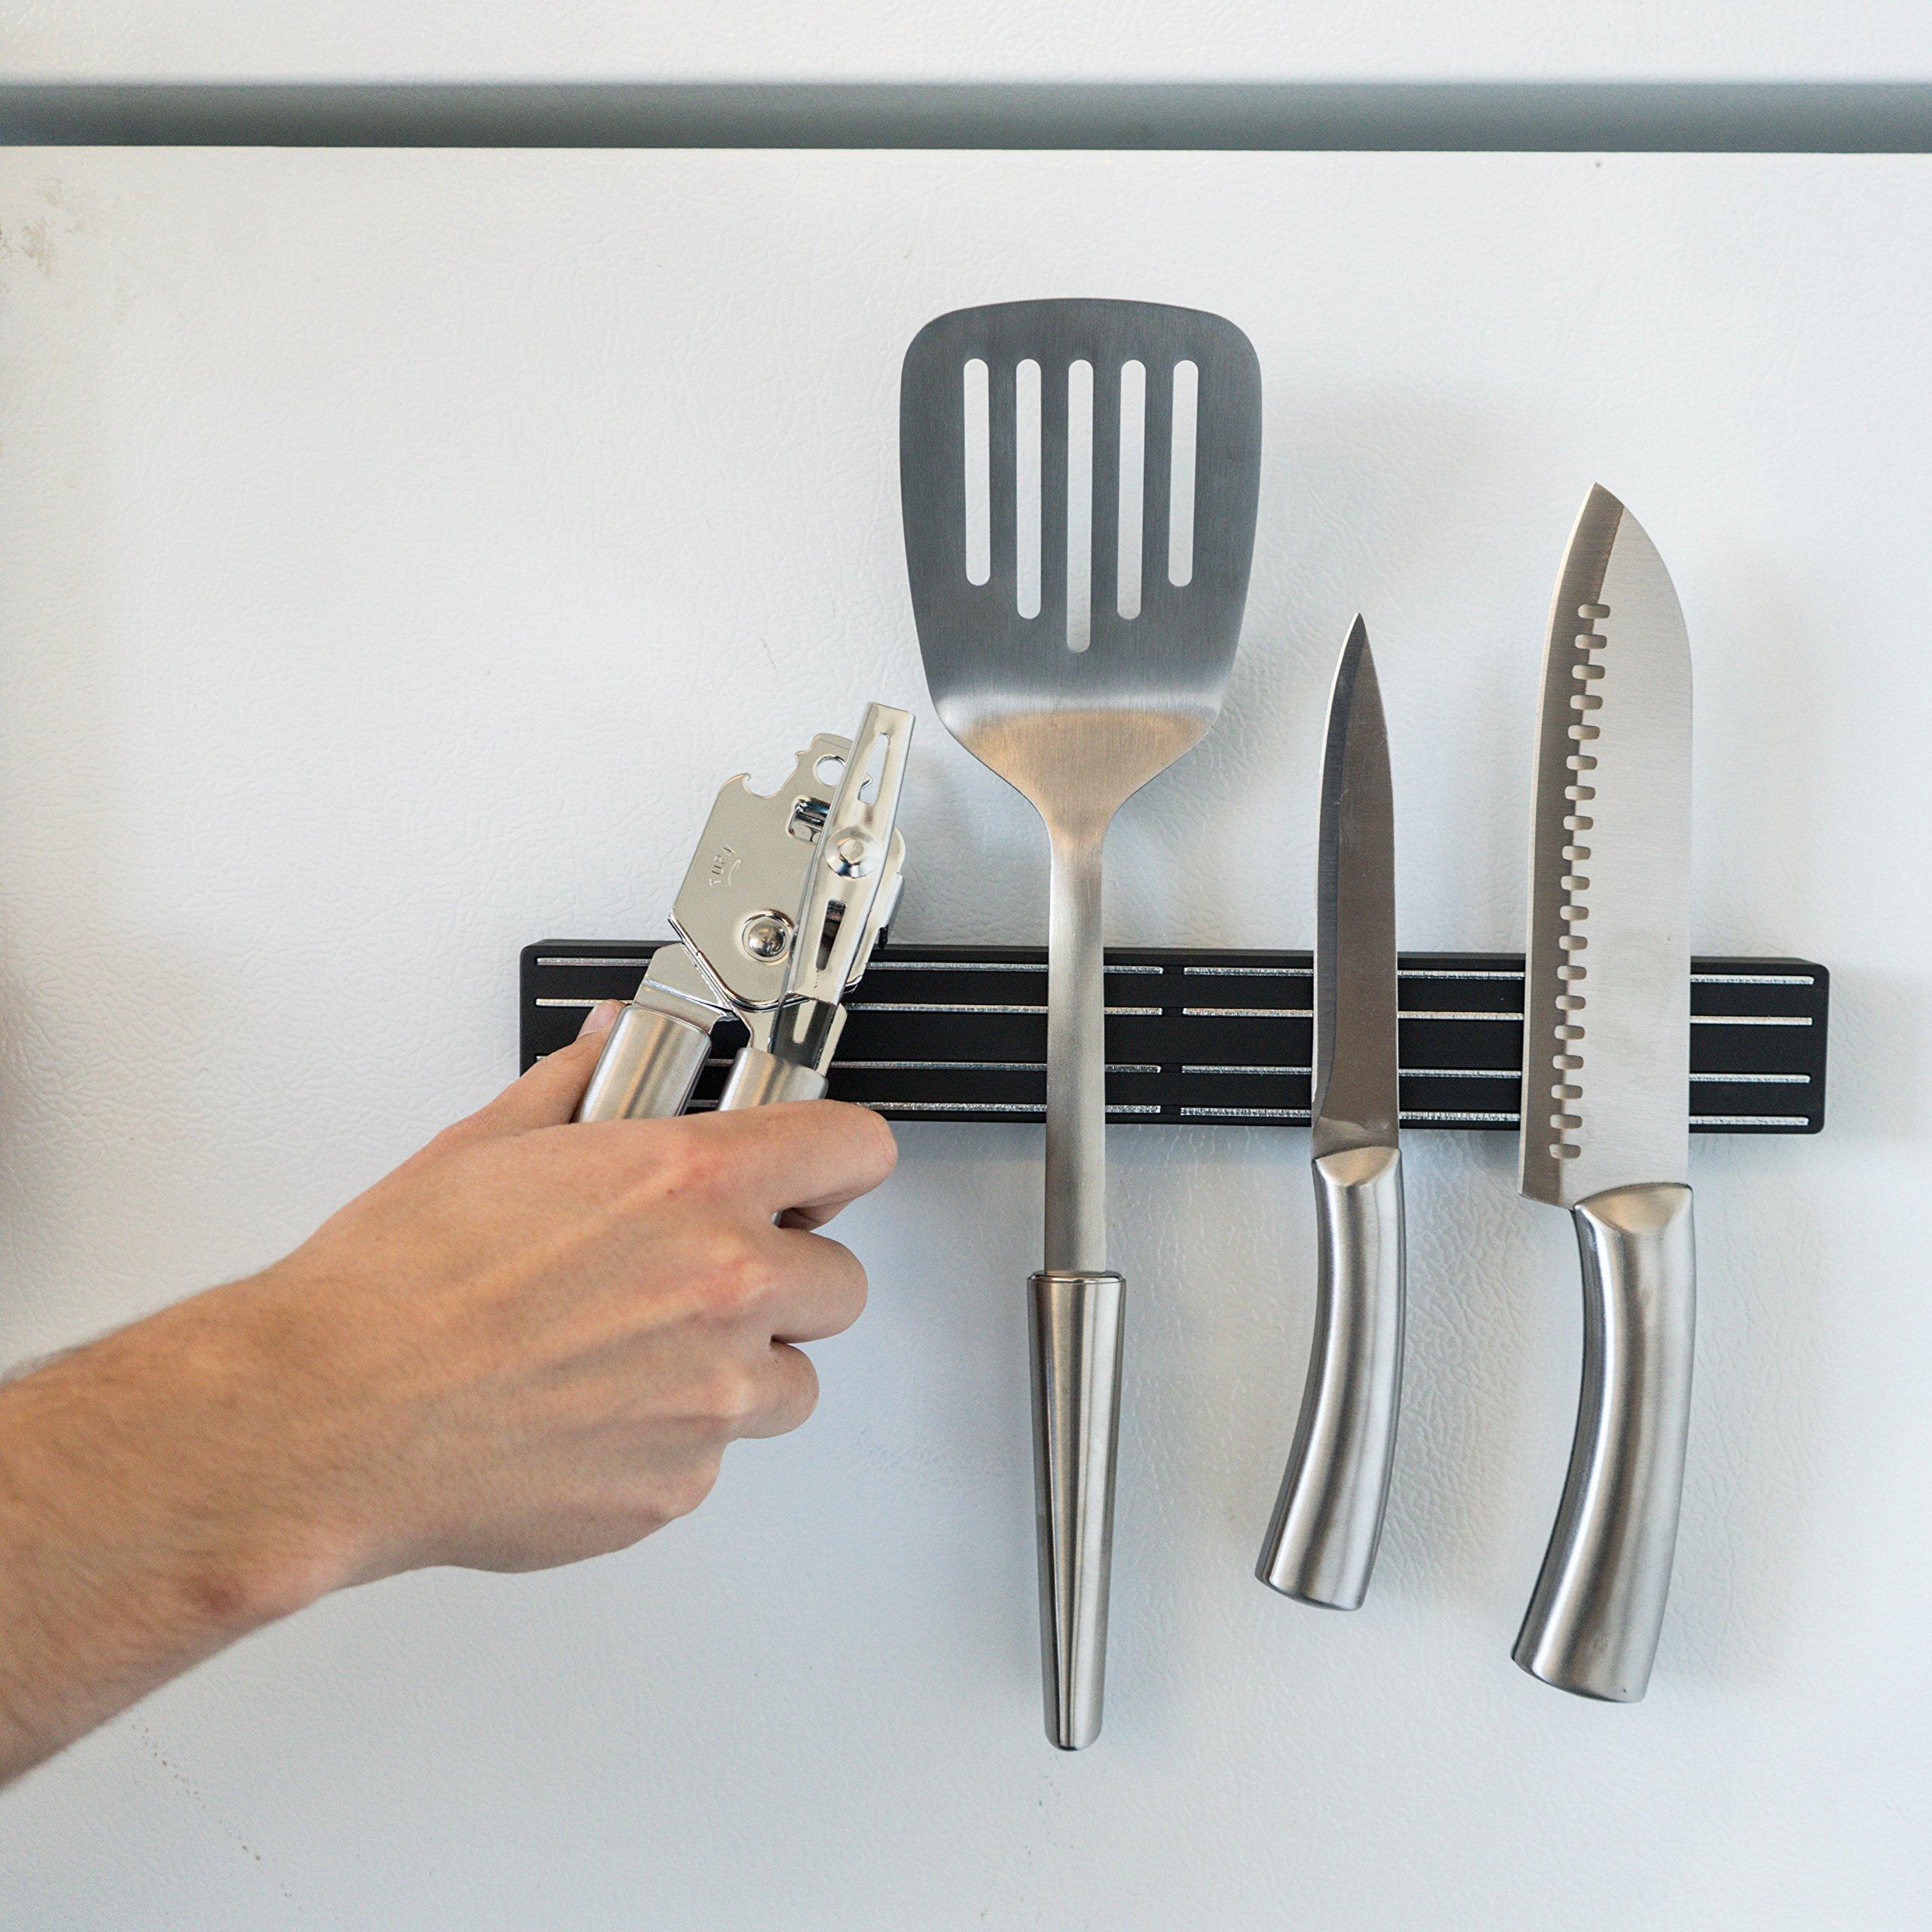 Master Magnetics Magnetic Tool Holder/Magnetic Knife Holder, 12-inch Double-Sided Magnet Strip, Mount on Metal Surface (Black) 07577 by Master Magnetics (Image #6)